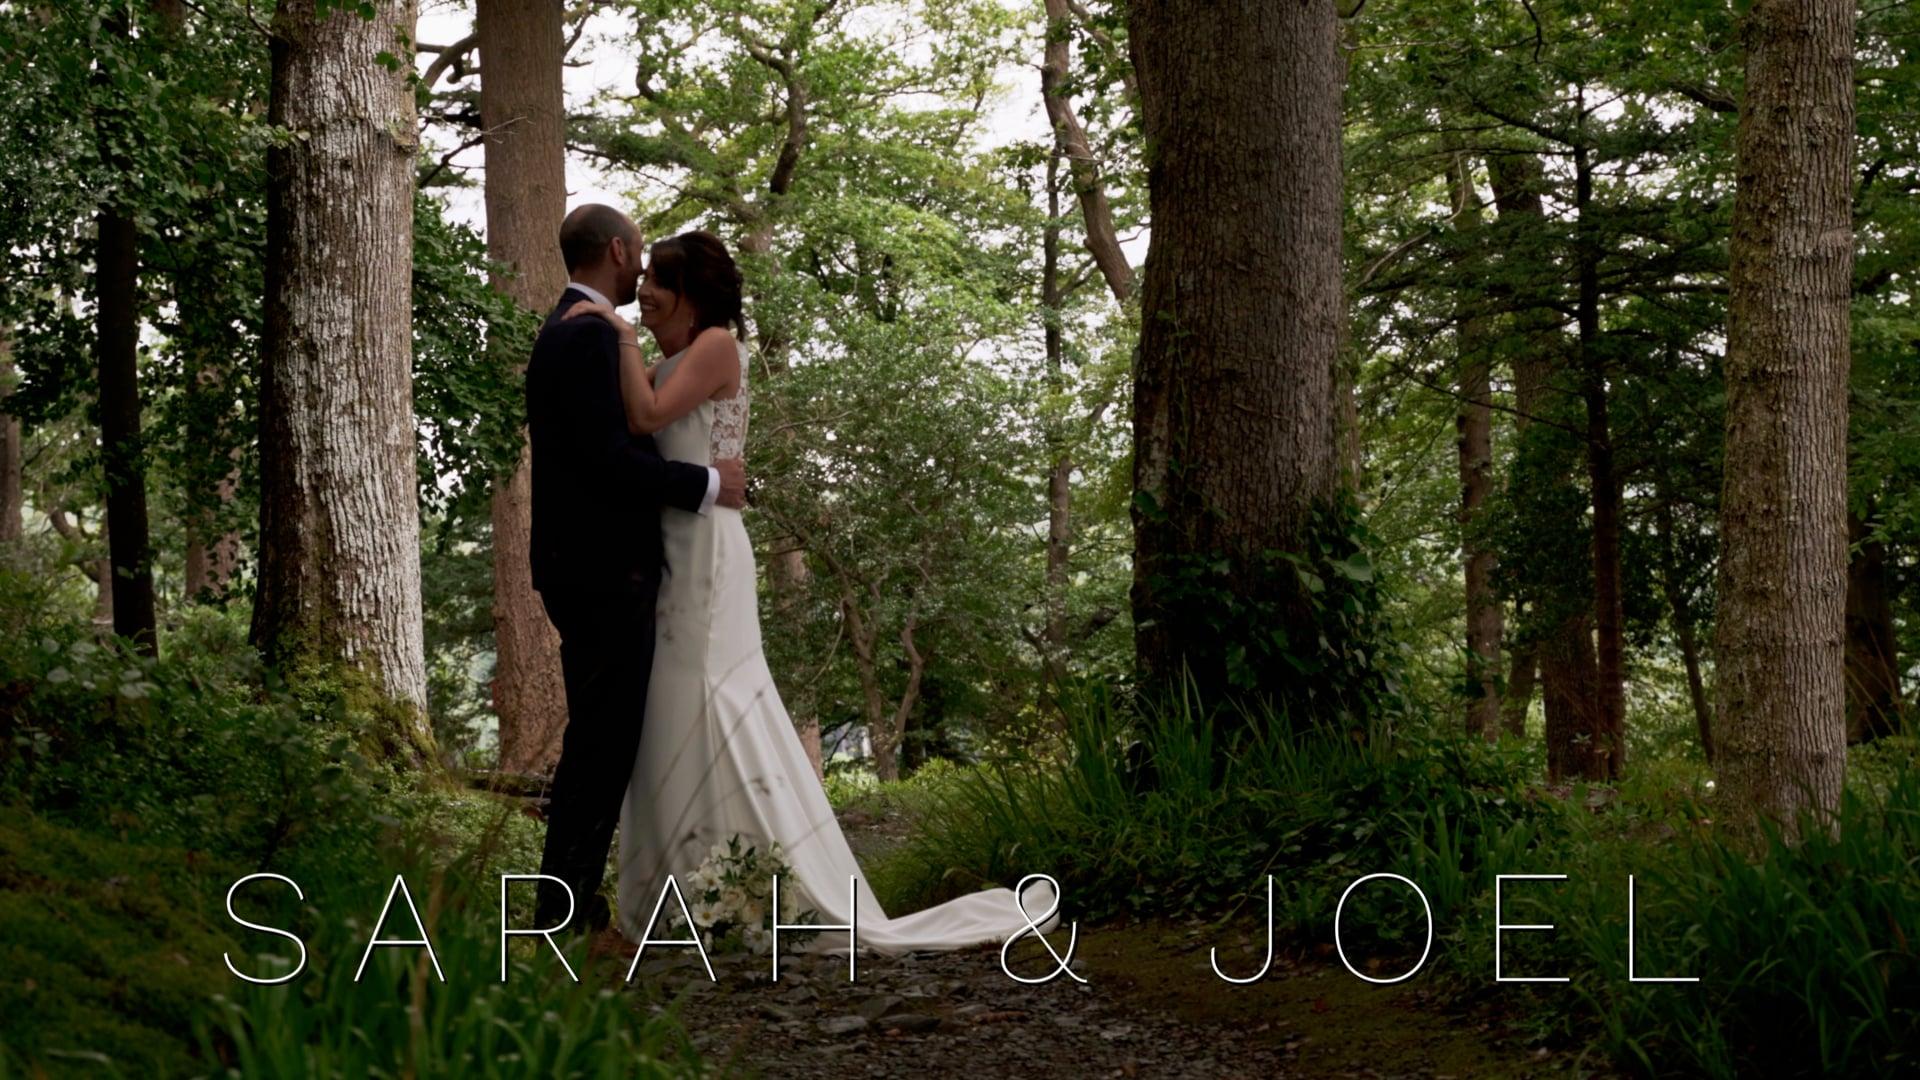 Sarah & Joel's Wedding Film | Storrs Hall - Bowness-on-Windermere